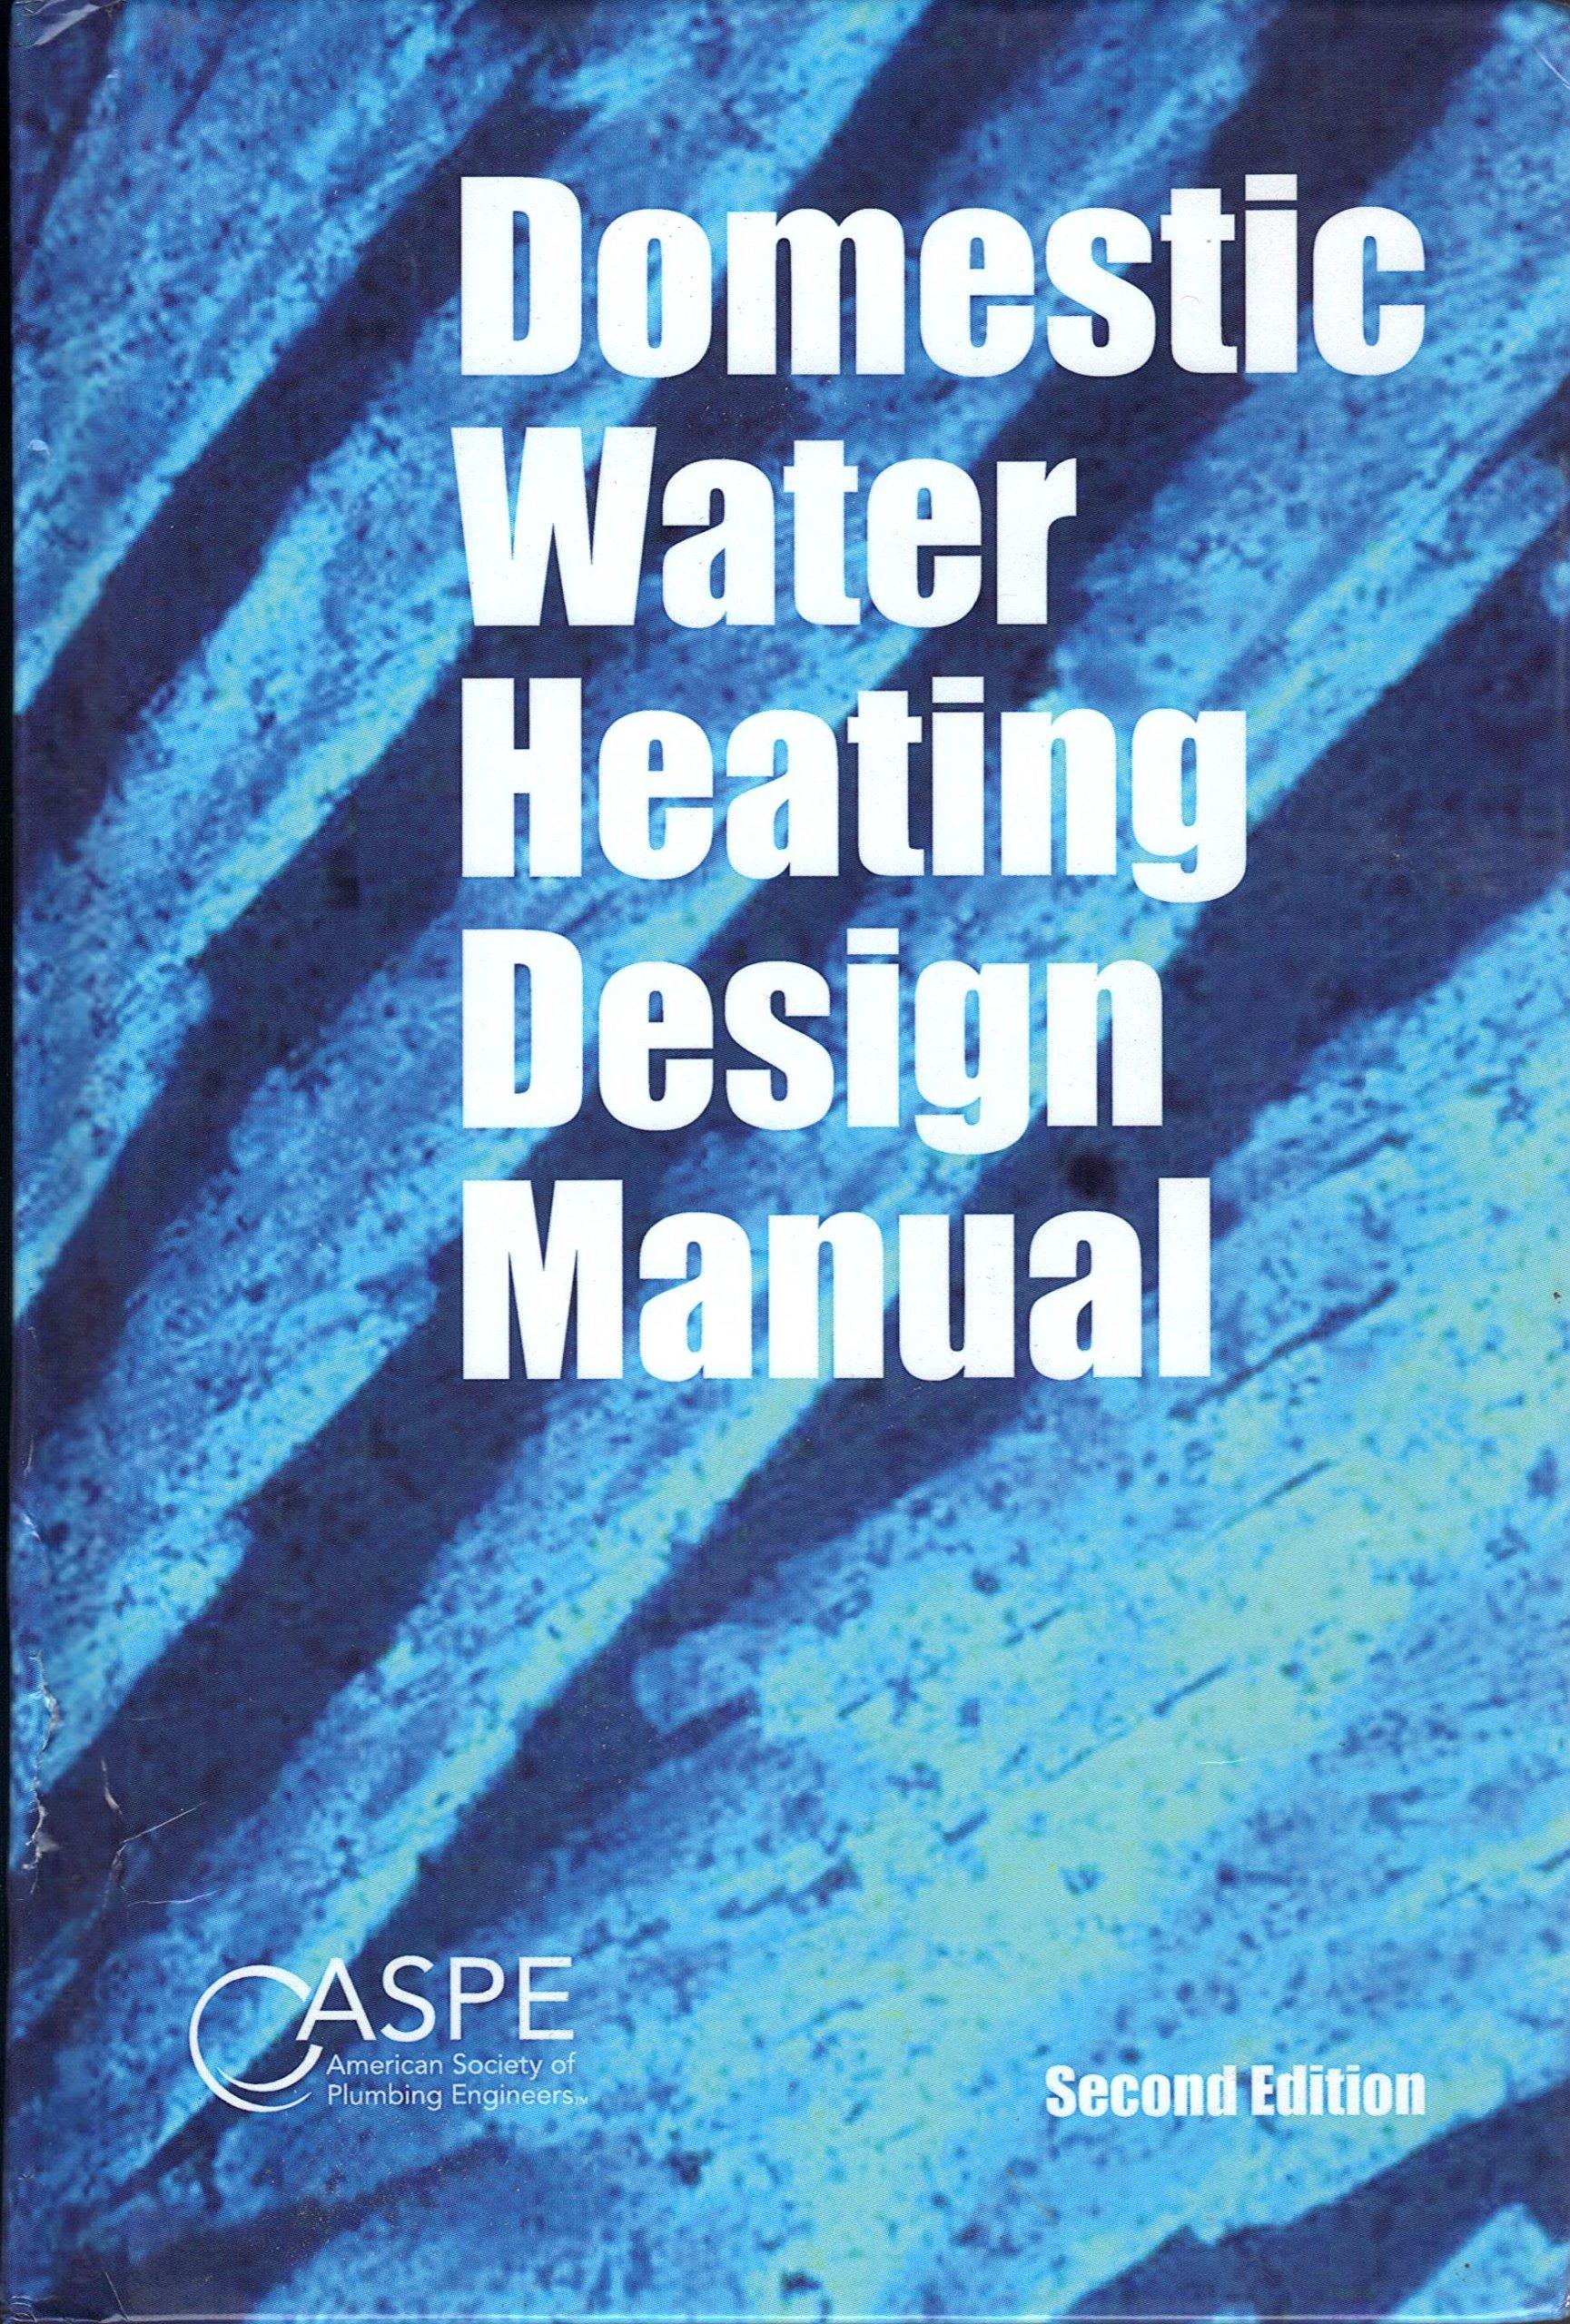 Domestic Water Heating Design Manual (2nd Edition): 9781891255182:  Amazon.com: Books